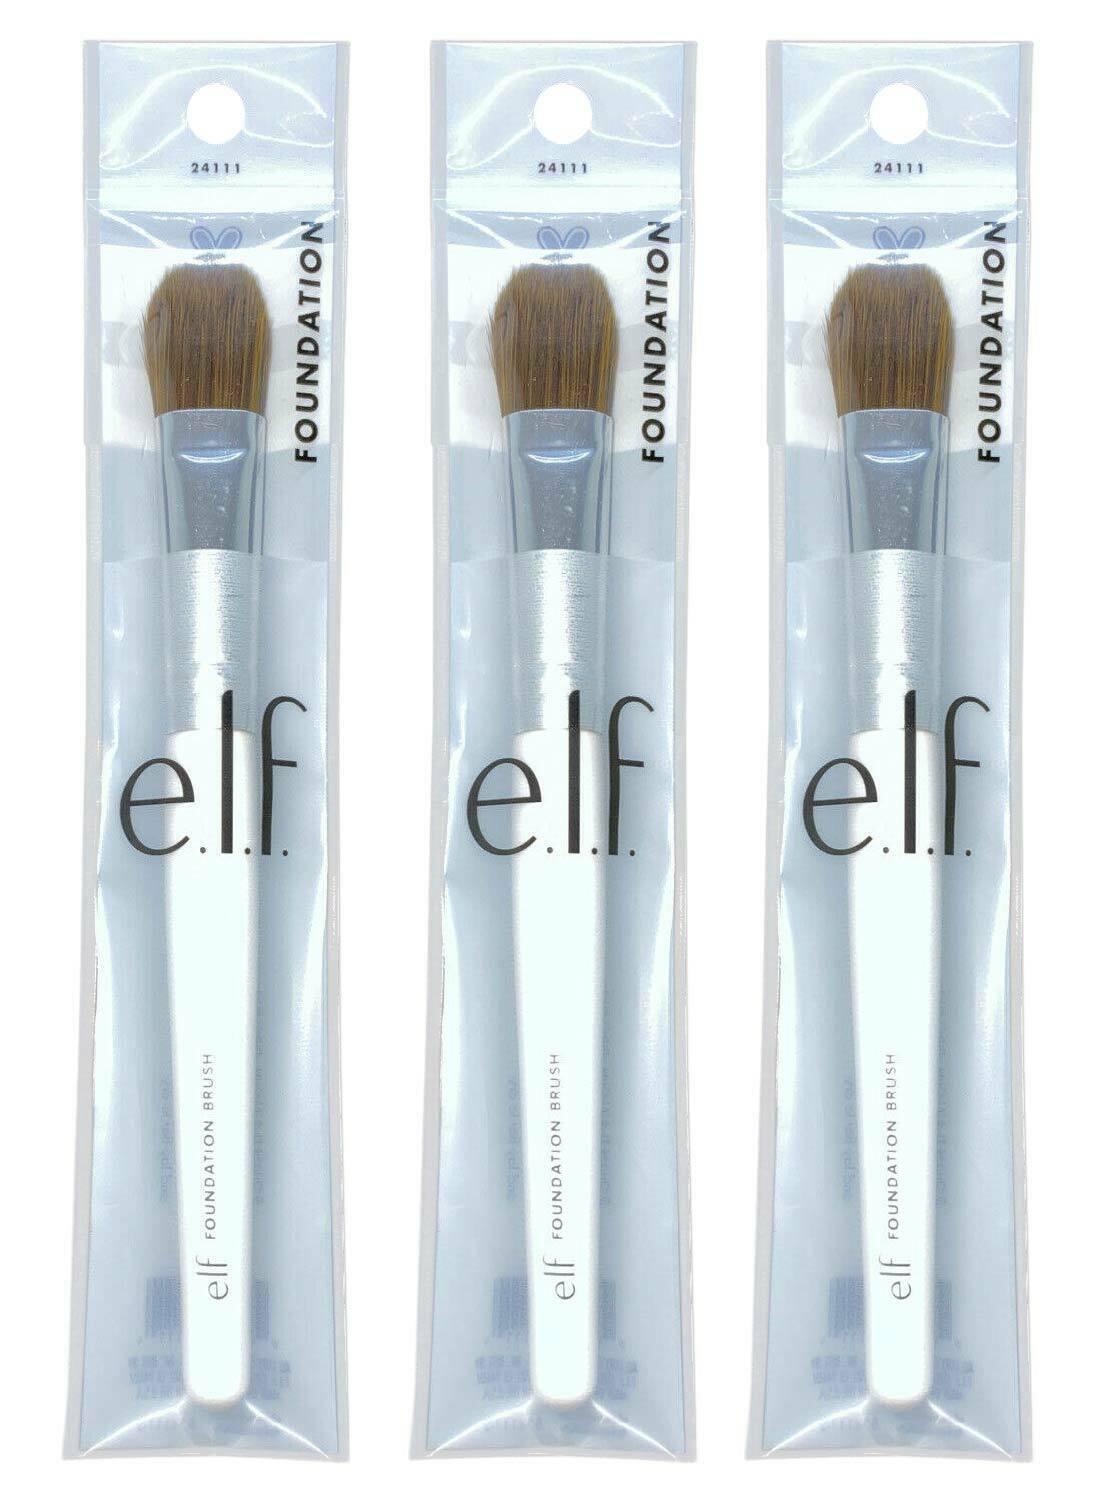 LOT of 3,  ELF Foundation Brush #24111 - NEW - $10.98